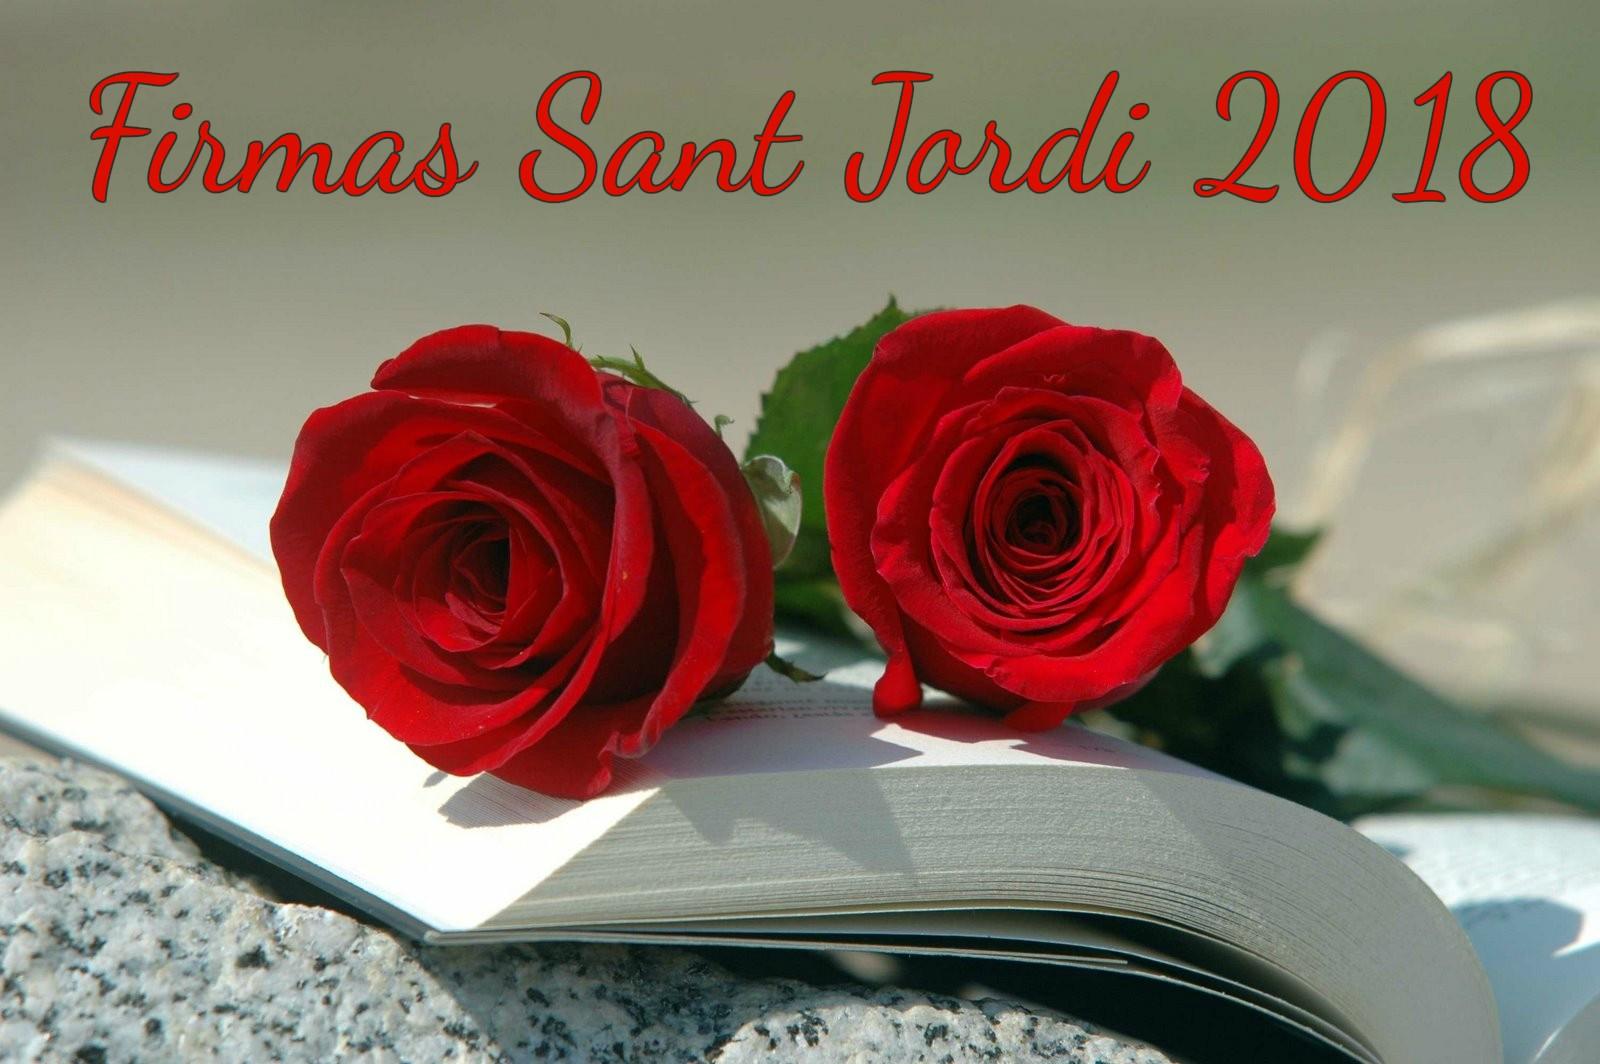 FIRMAS DE SANT JORDI 2018